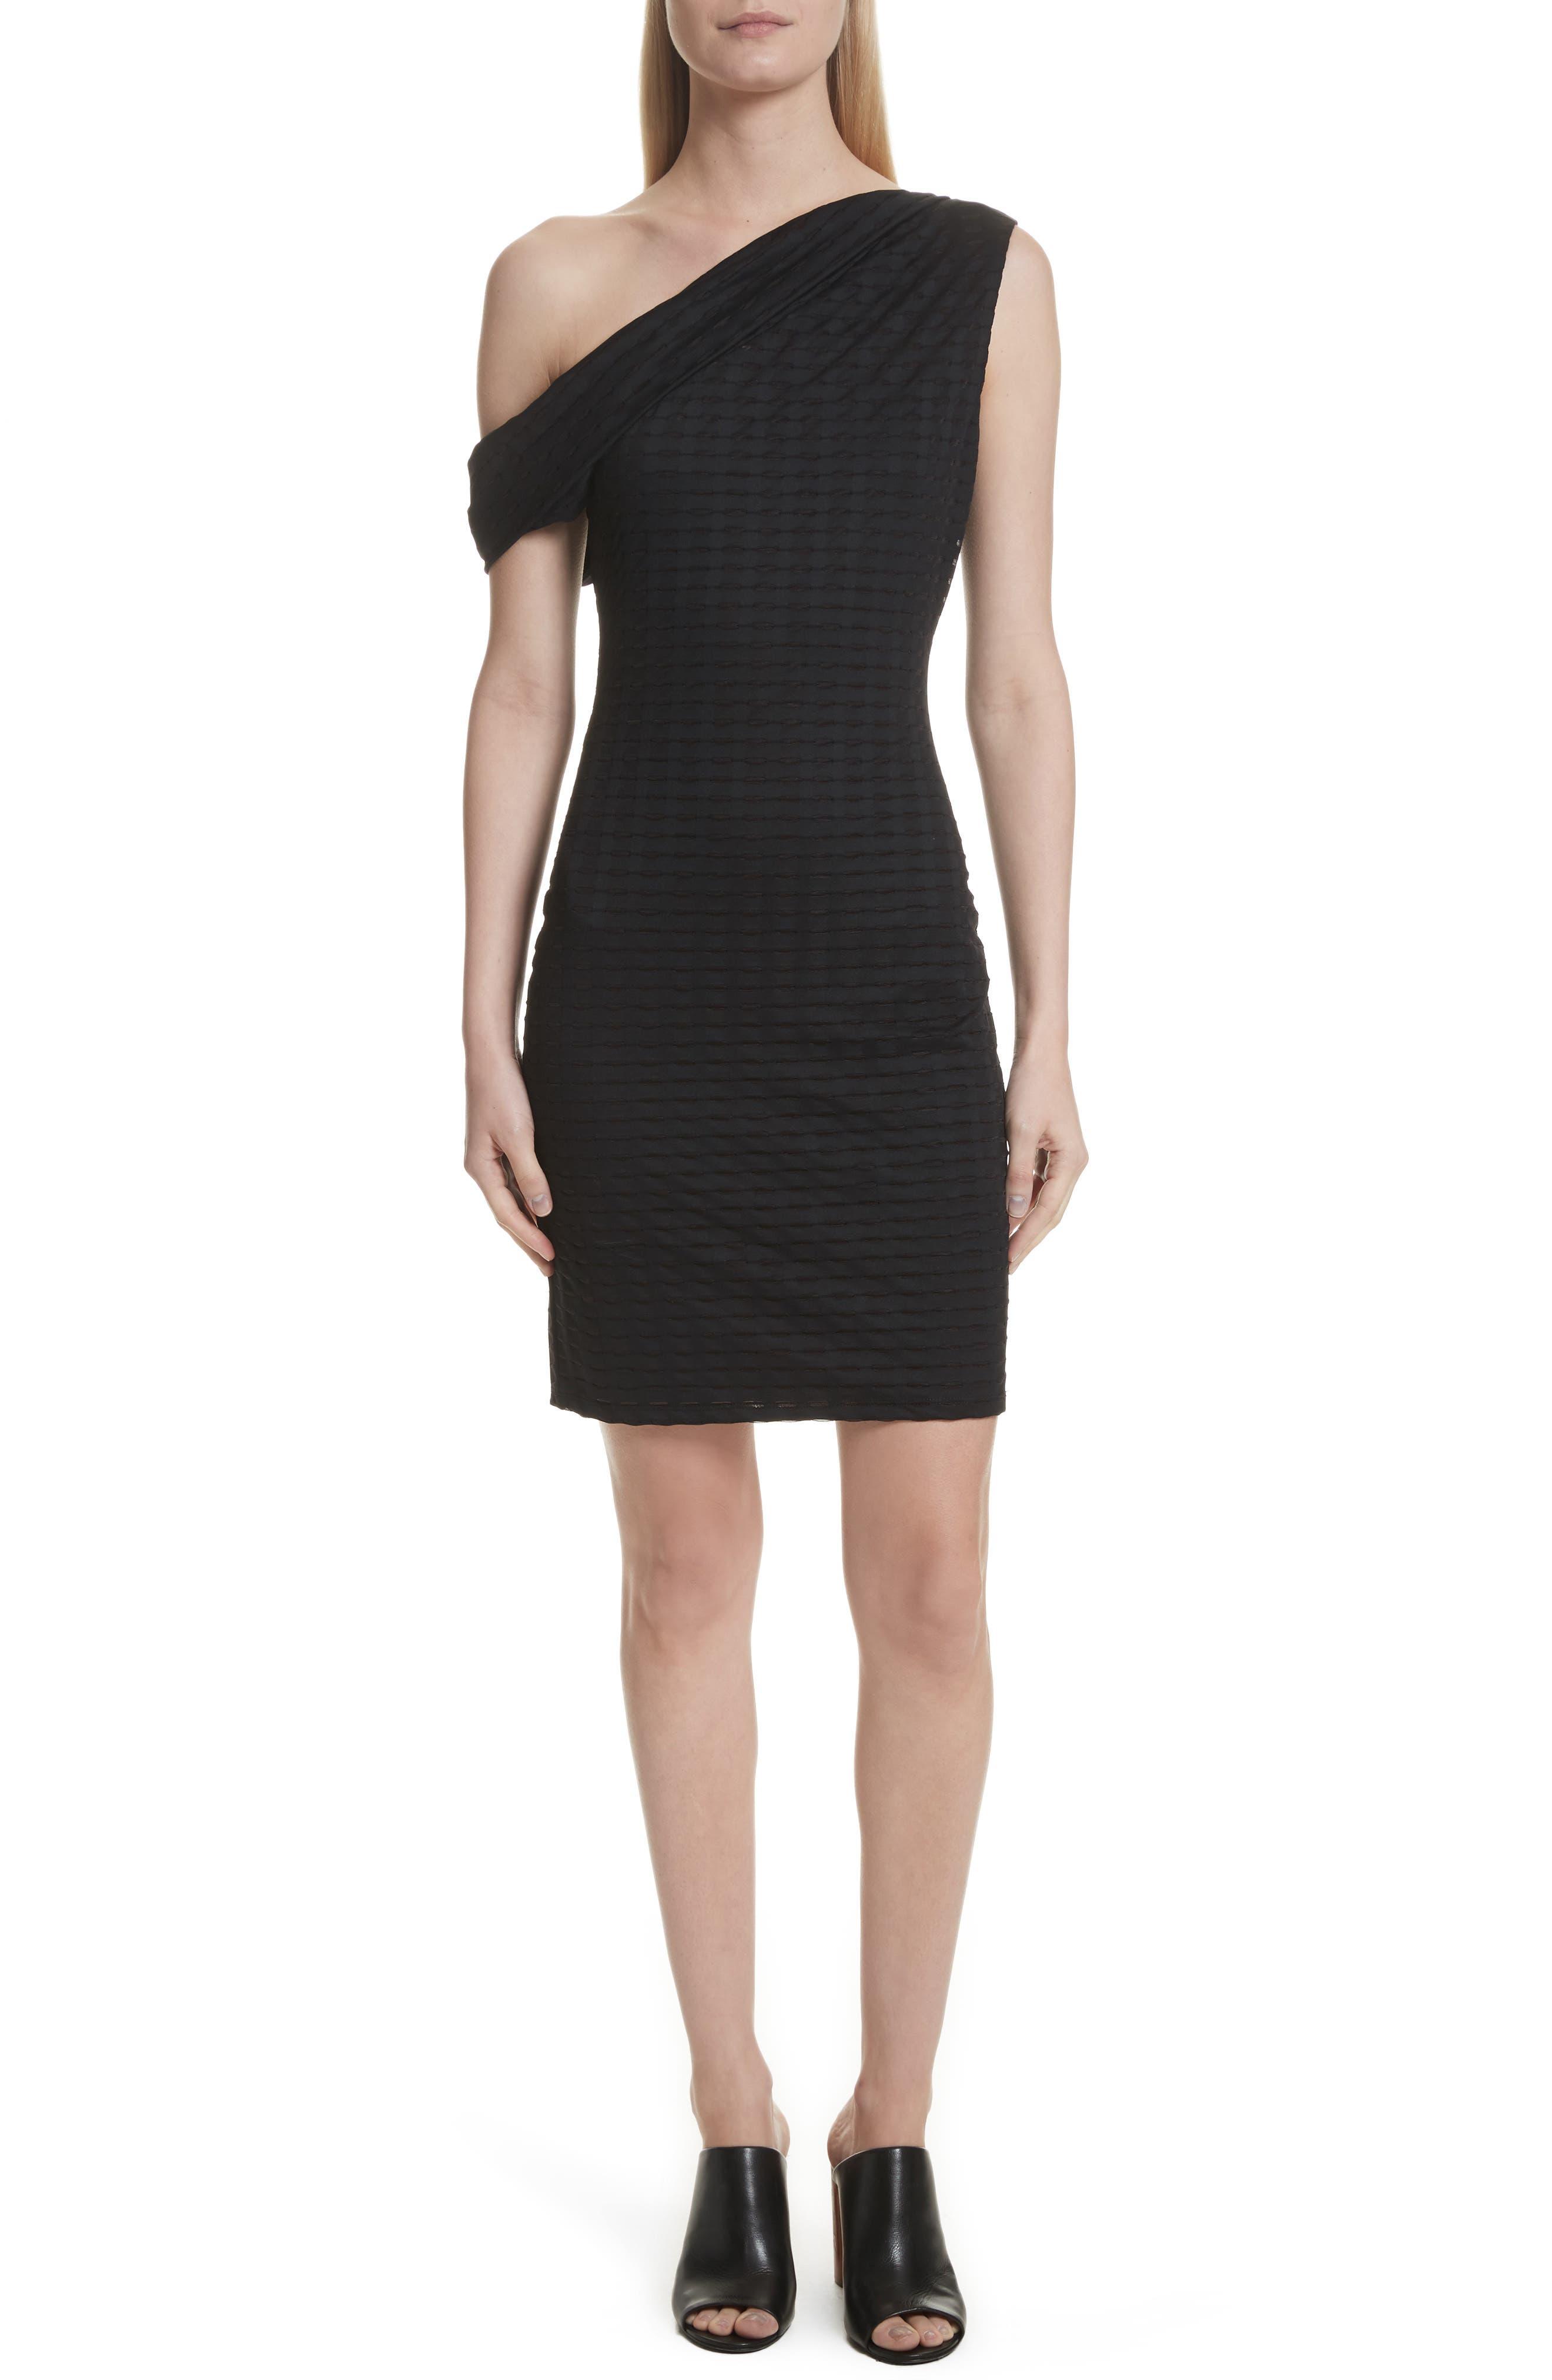 Twenty One-Shoulder Minidress